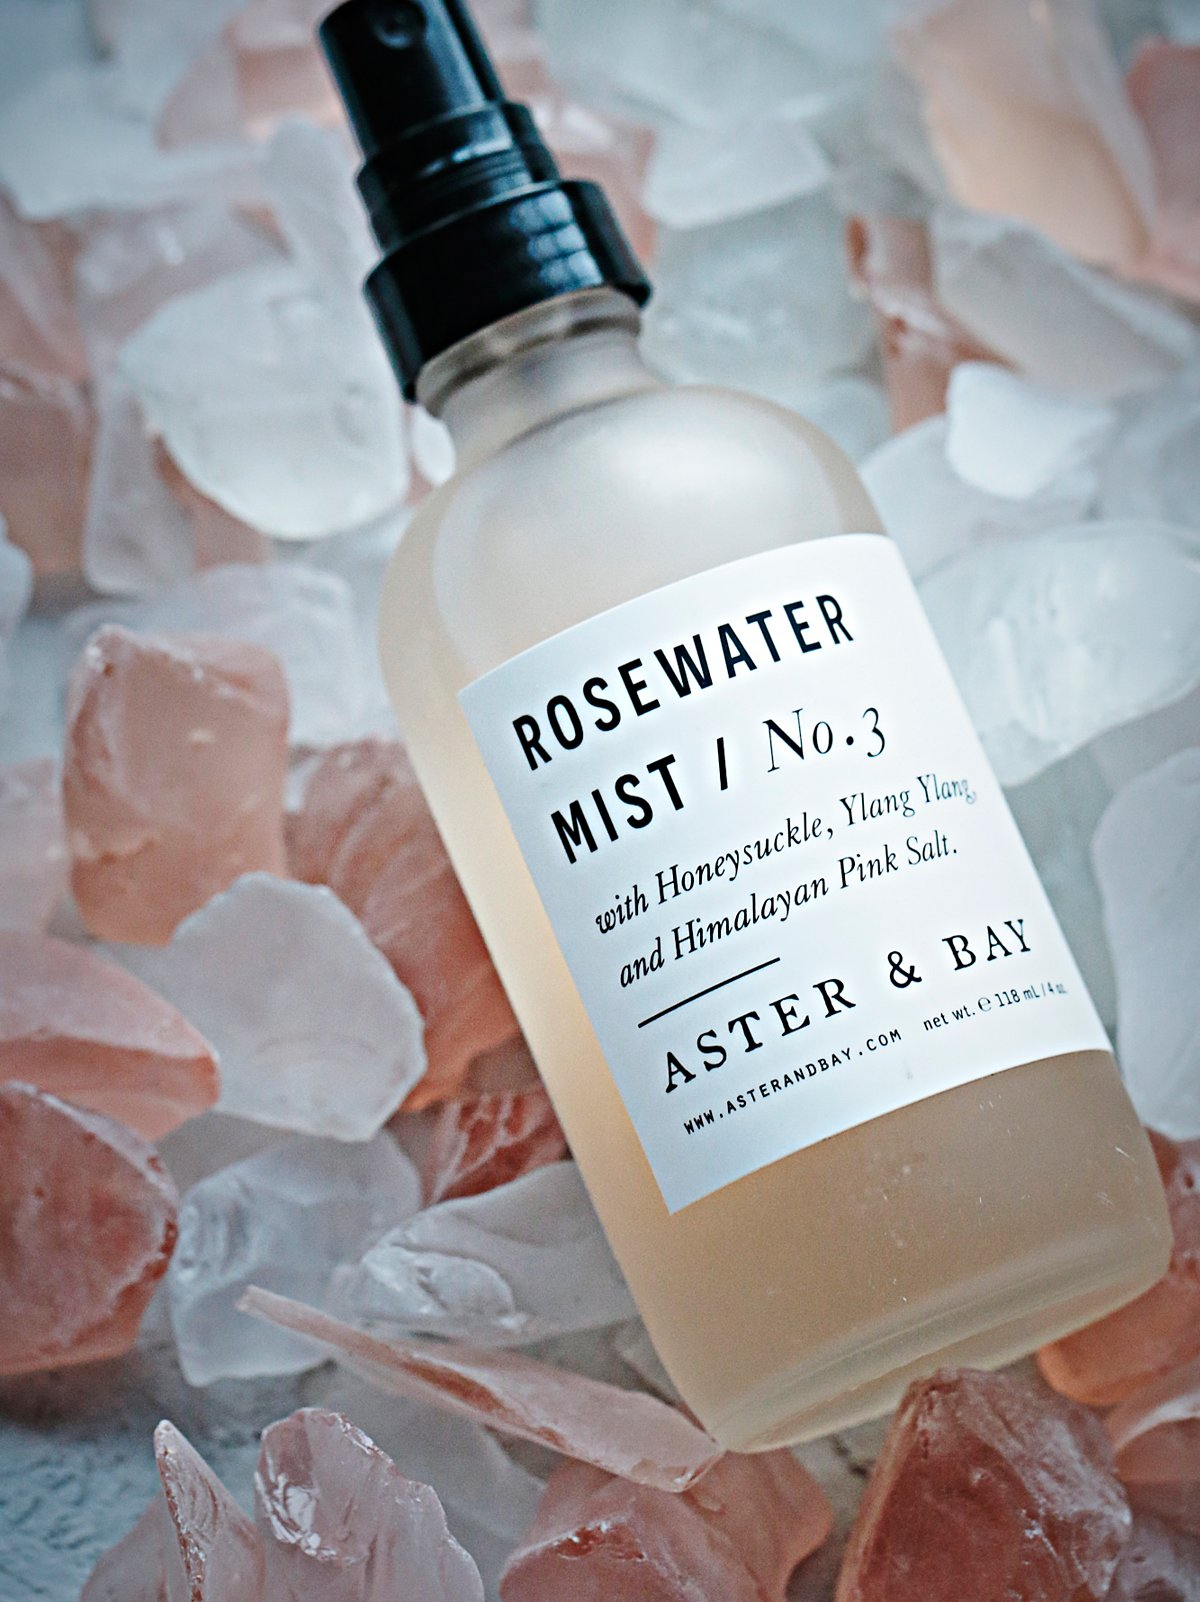 Rosewater Mist